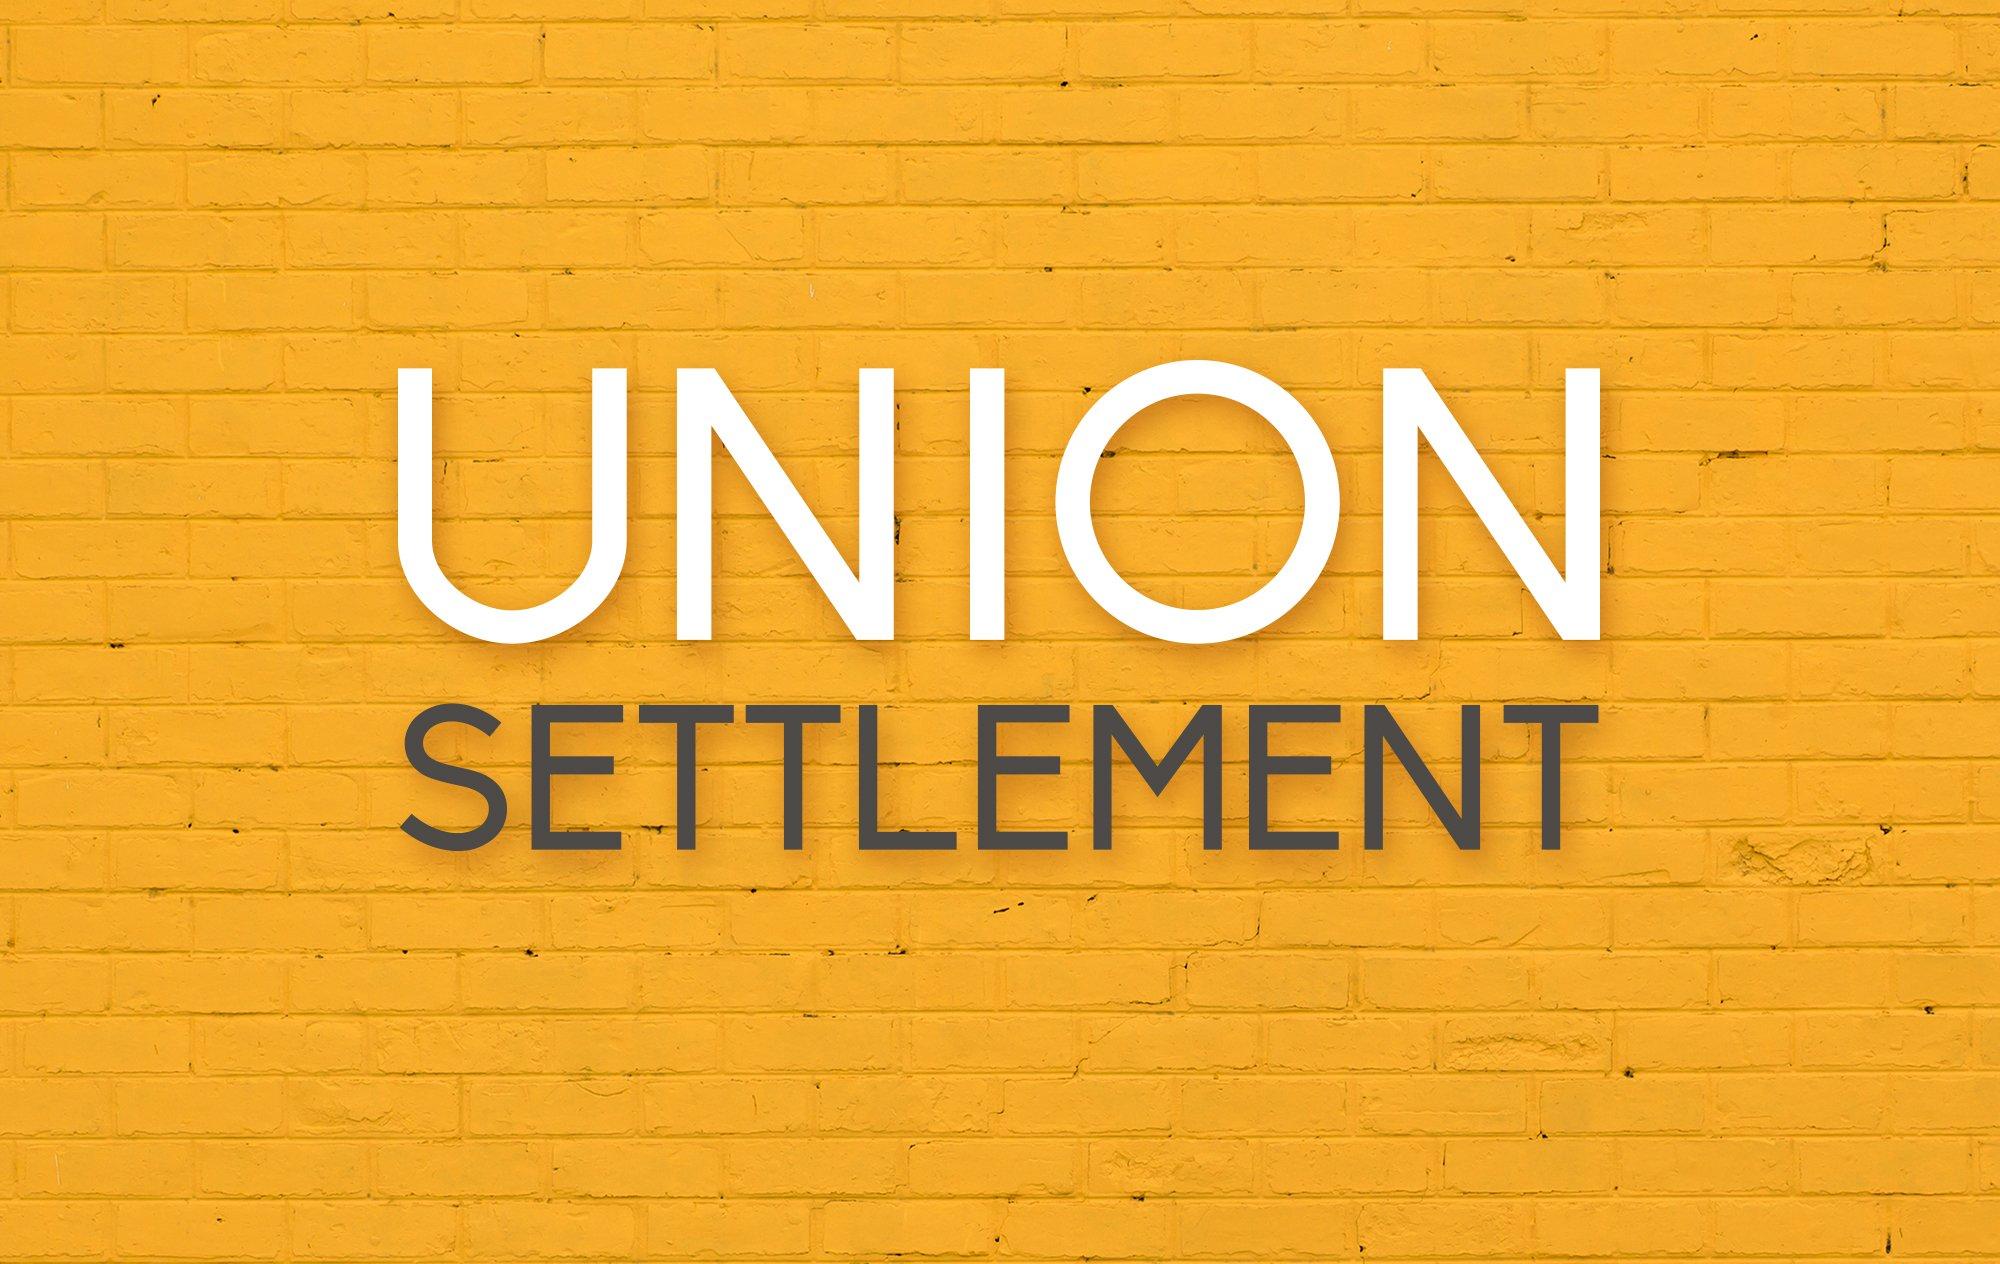 Union Settlement logo against brick background